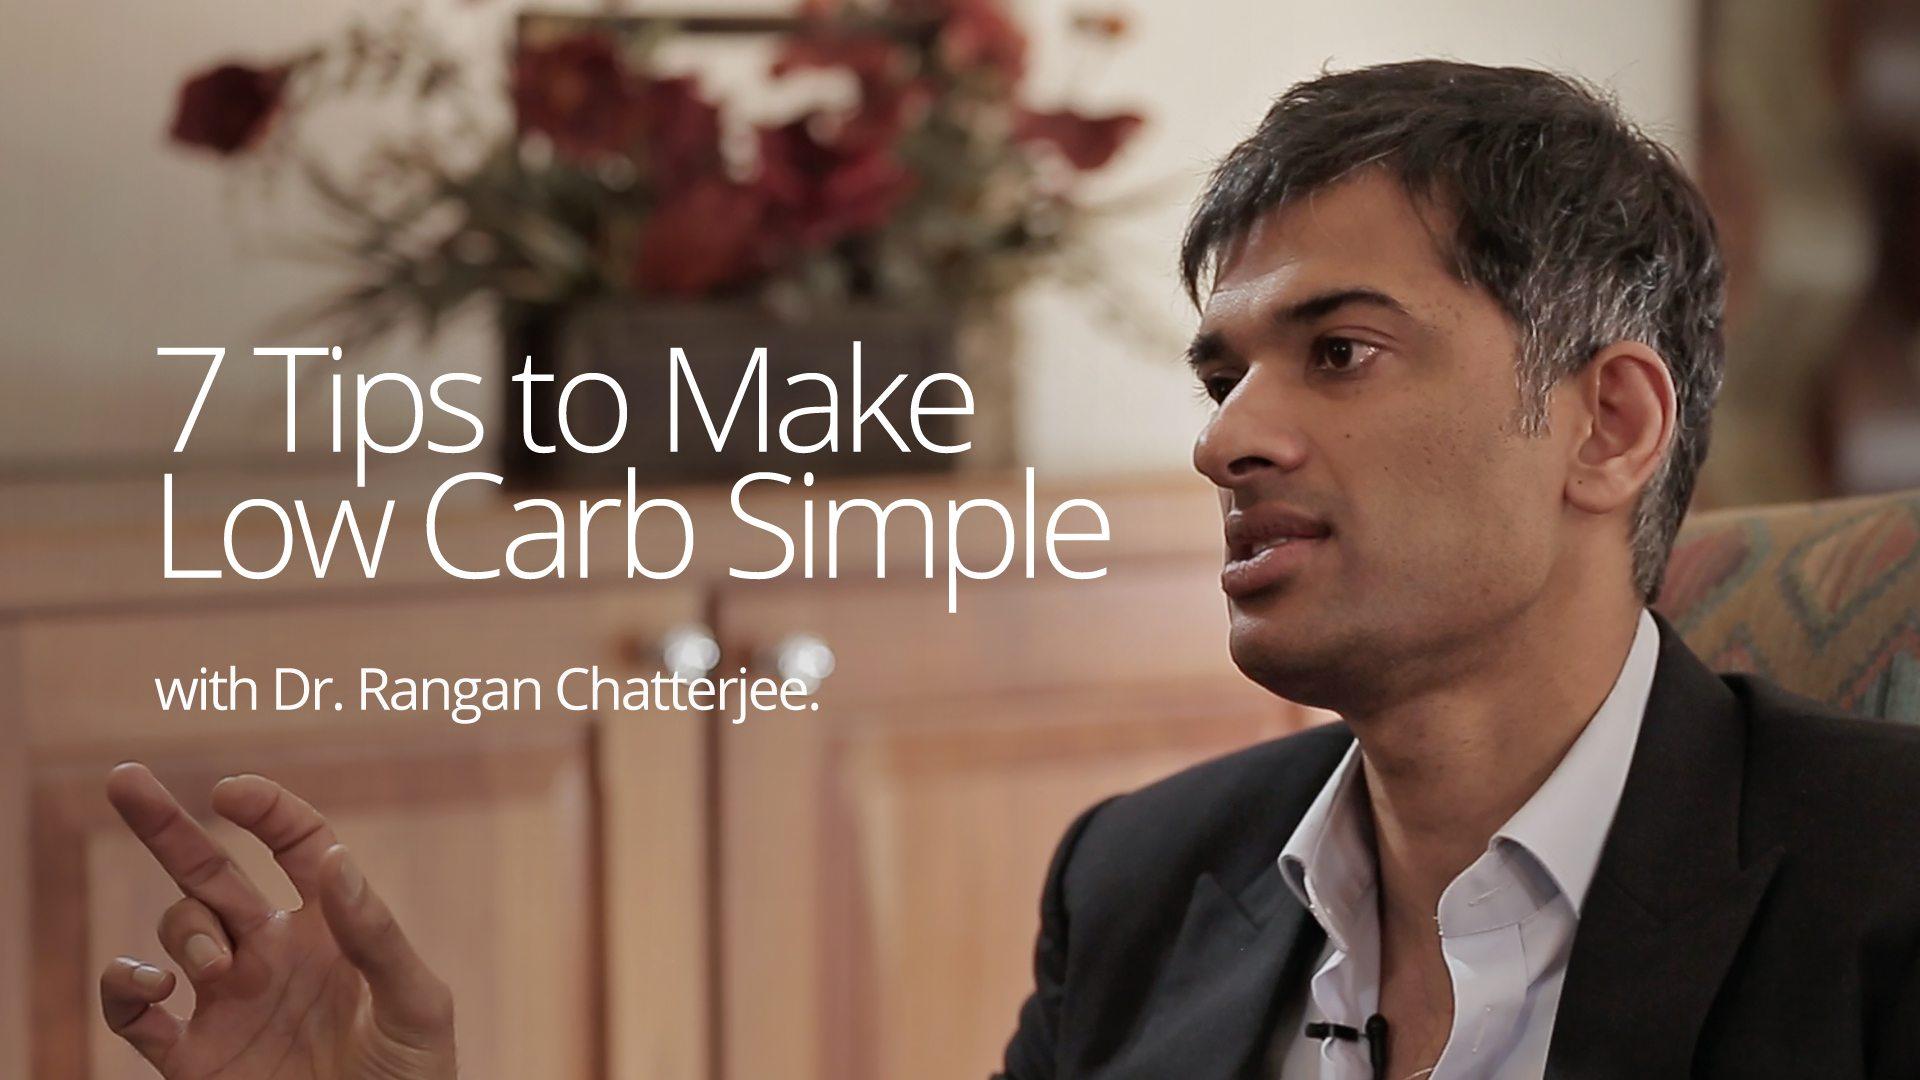 7 Tips to Make Low Carb Simple - Dr. Rangan Chatterjee